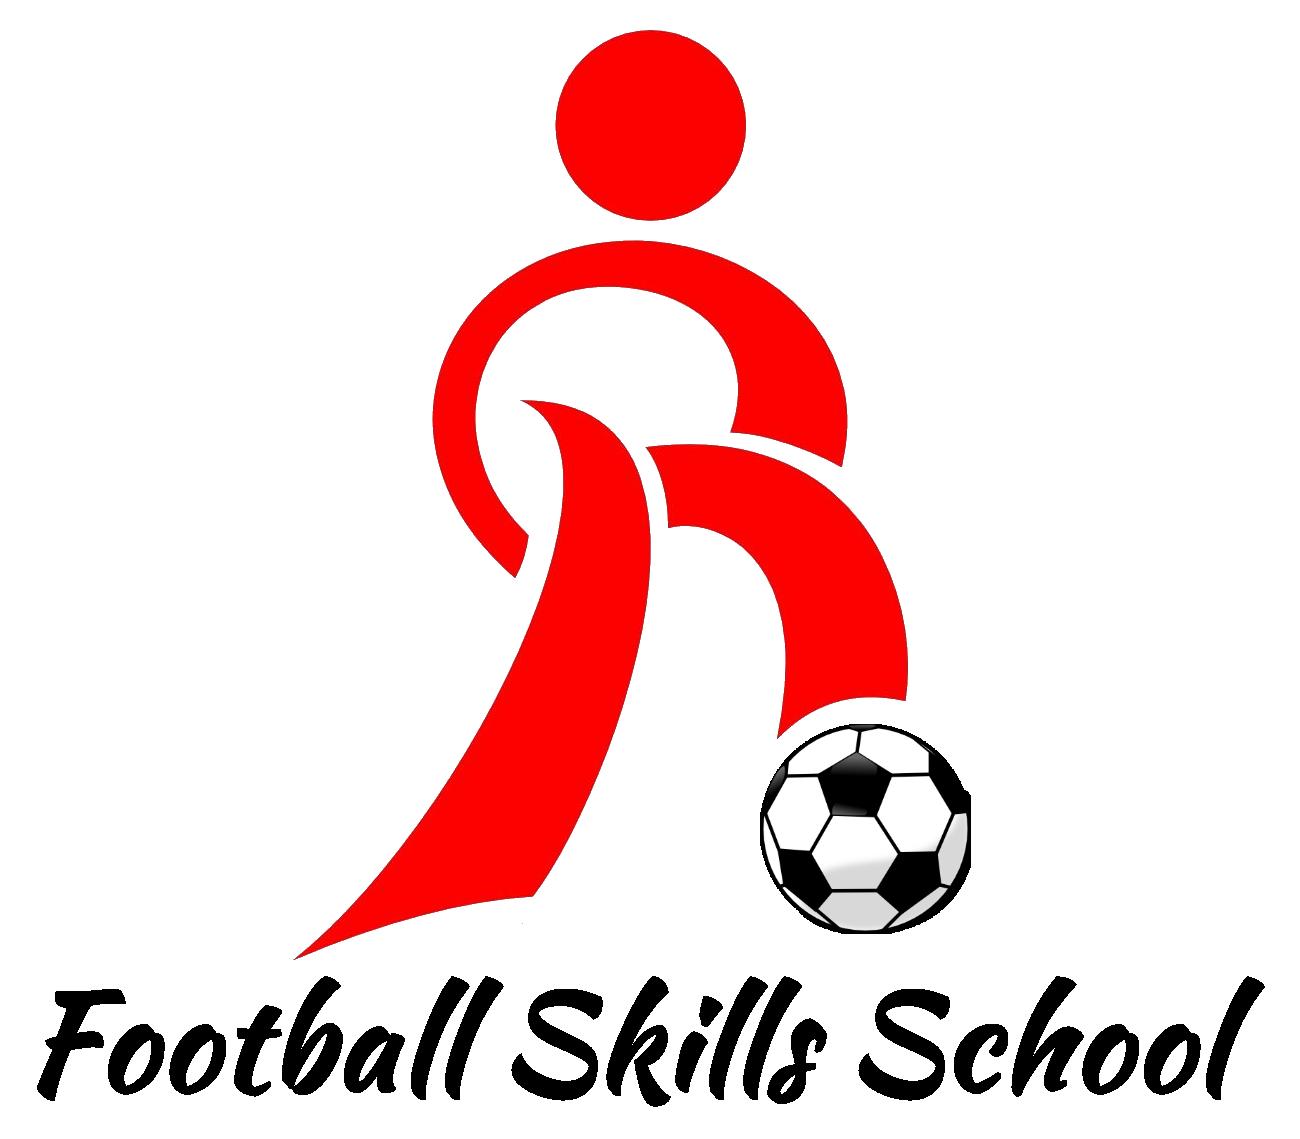 Football Skills School